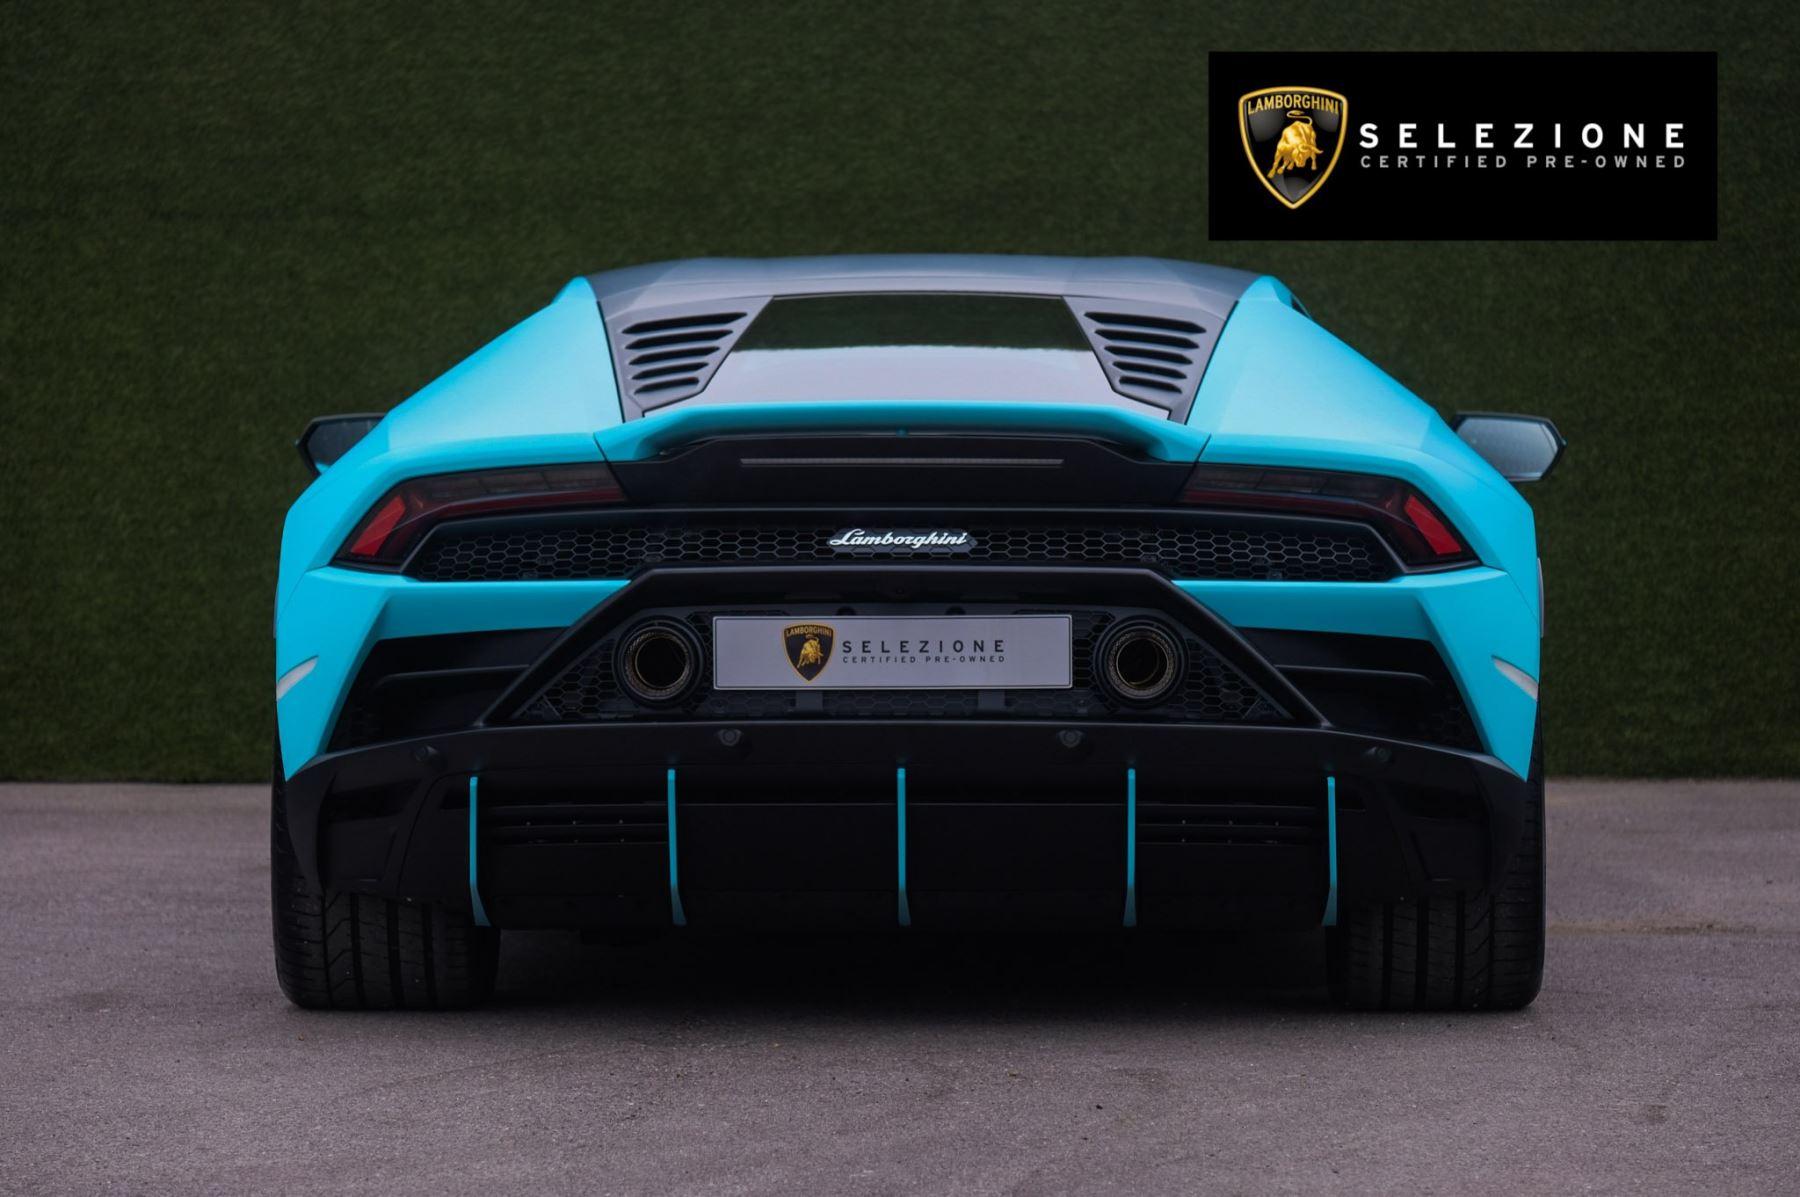 Lamborghini Huracan EVO Coupe image 4